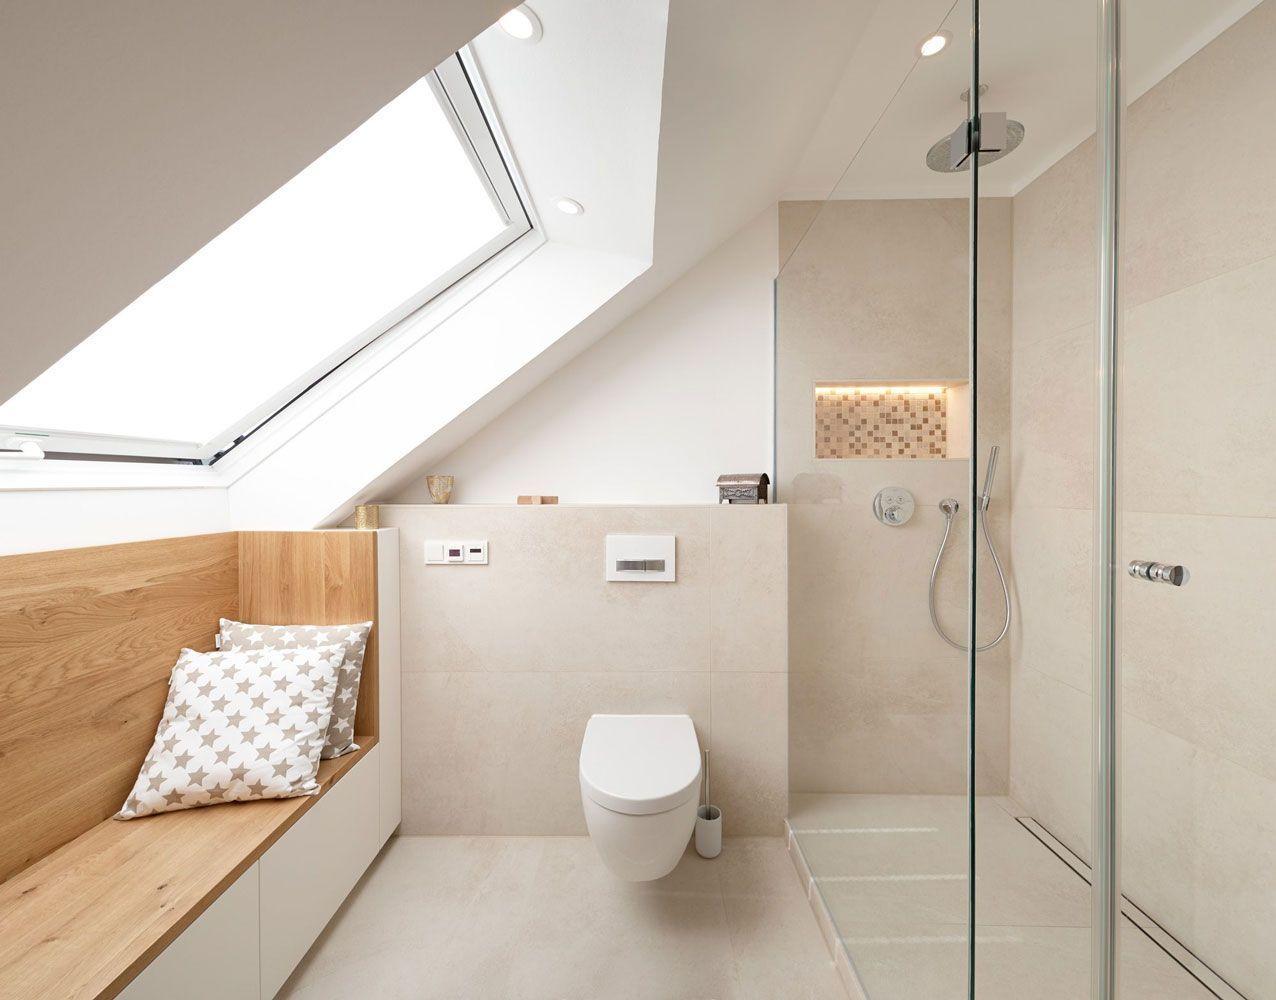 Koeln Bad Mobel Mobel Badezimmer Bad Mobel In Der Dachschrage In 2020 Badezimmer Dachschrage Bad Einrichten Badezimmer Dachgeschoss